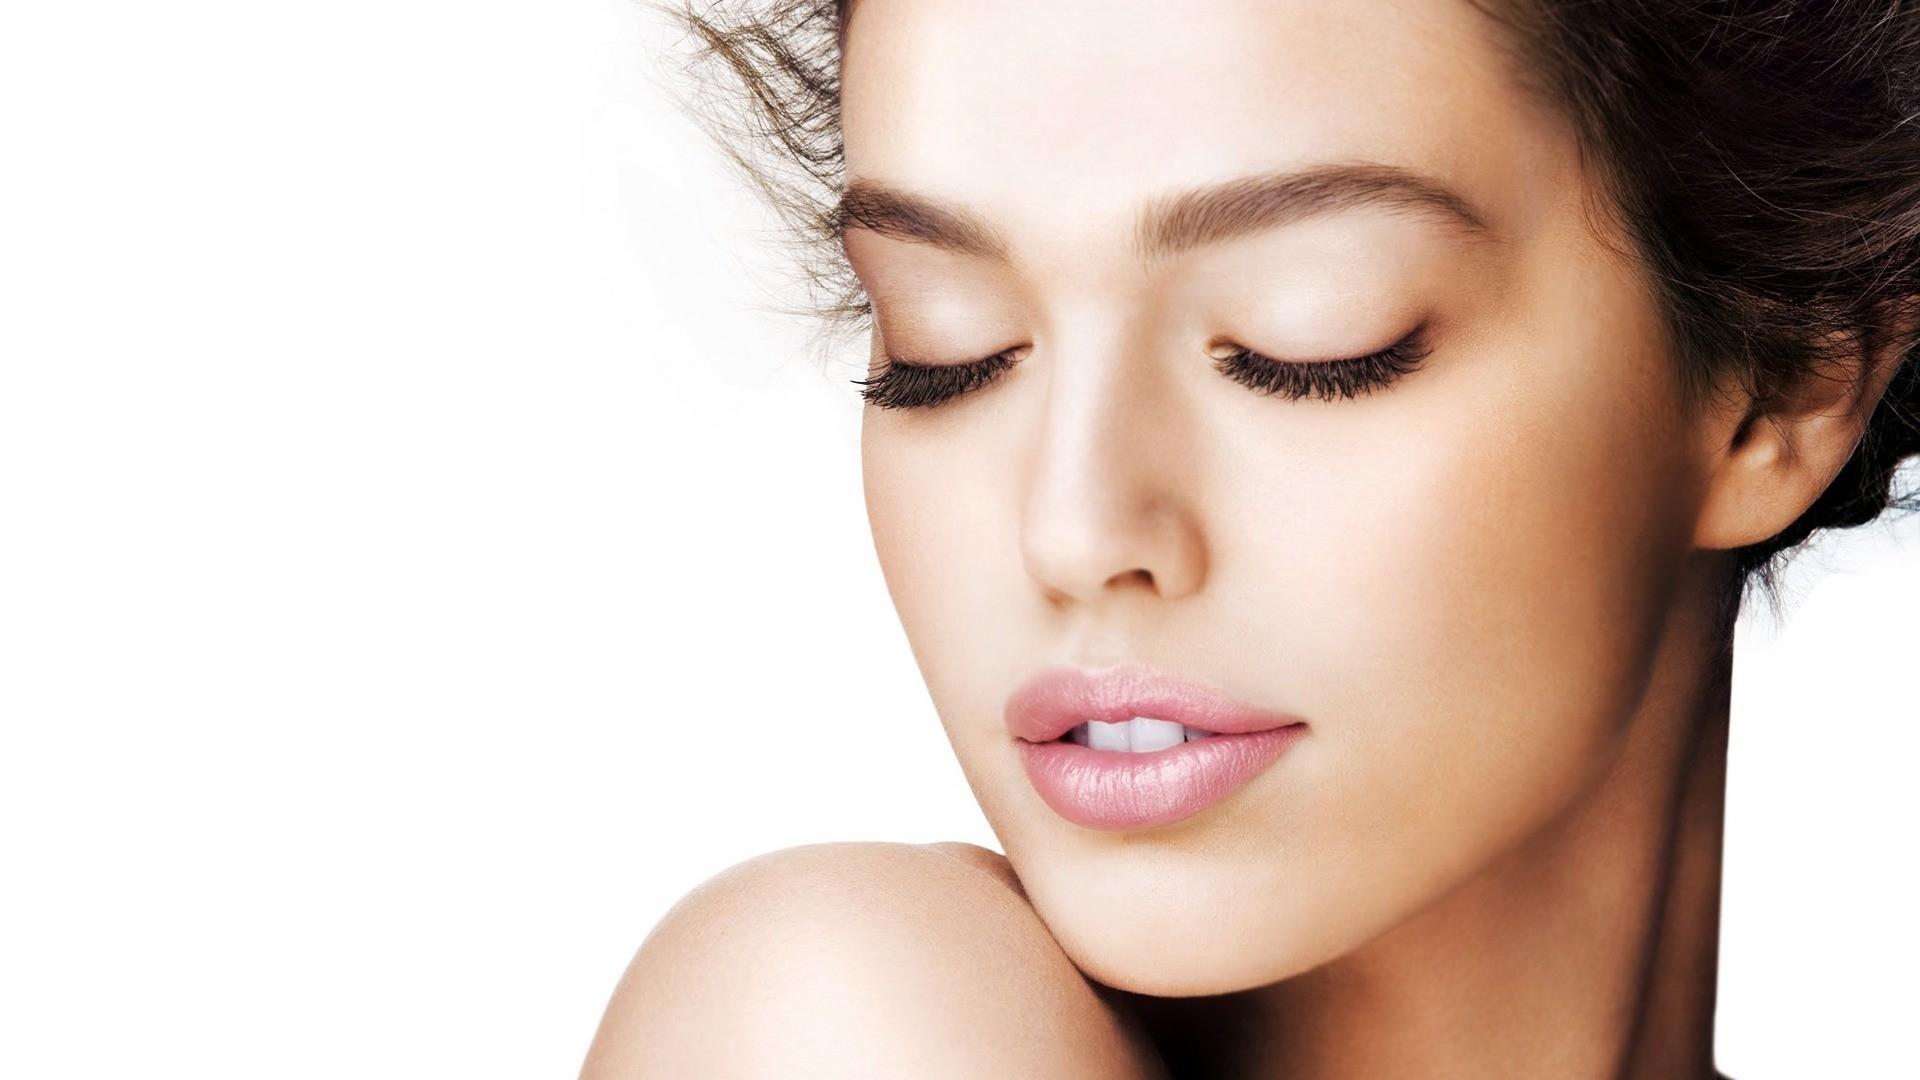 The-Secrets-Of-Women-With-Beautiful-Skin-4-1.jpg